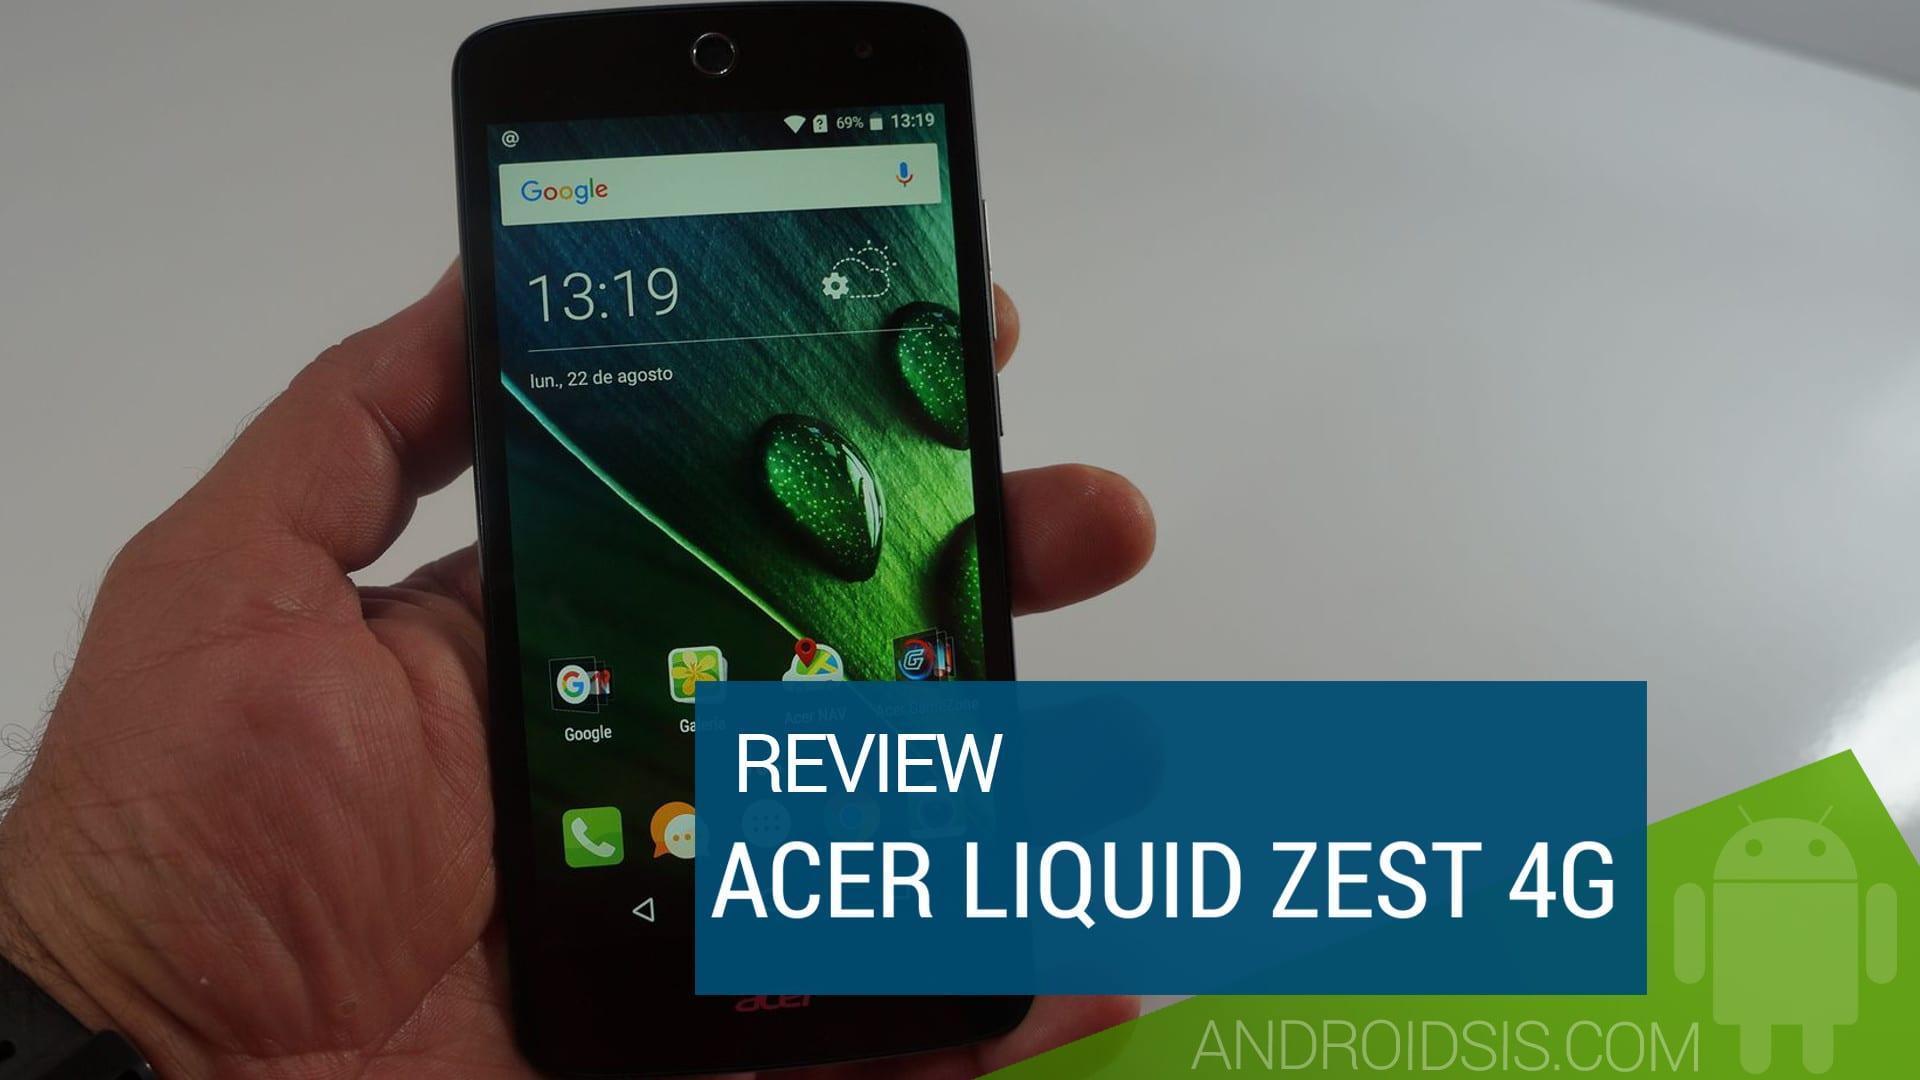 Review ACER Liquid Zest 4G